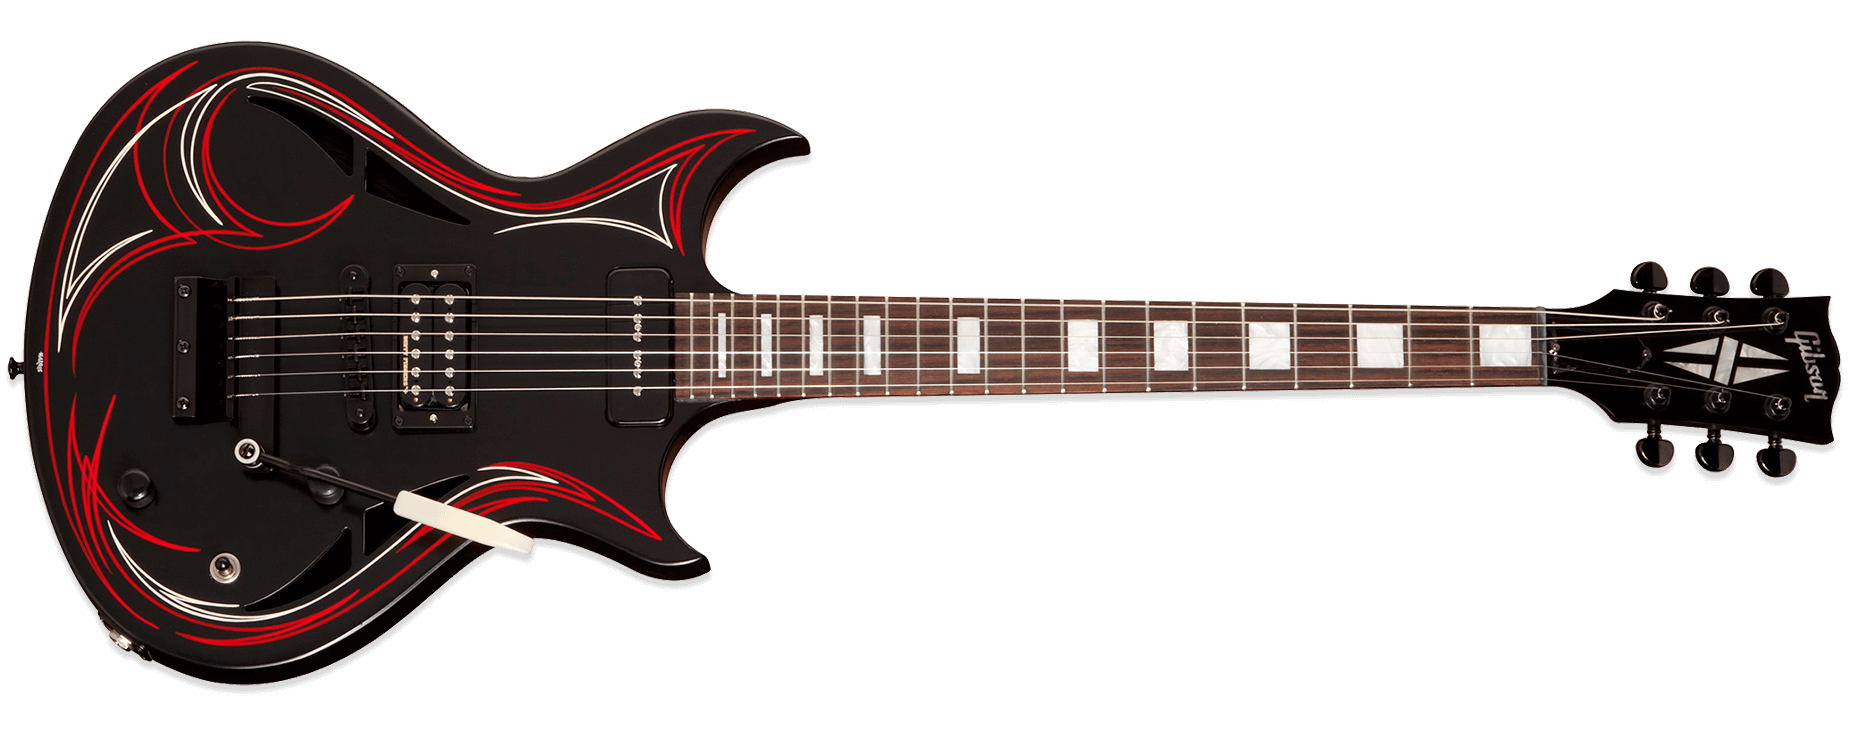 Gibson Designer N-225 Ebony